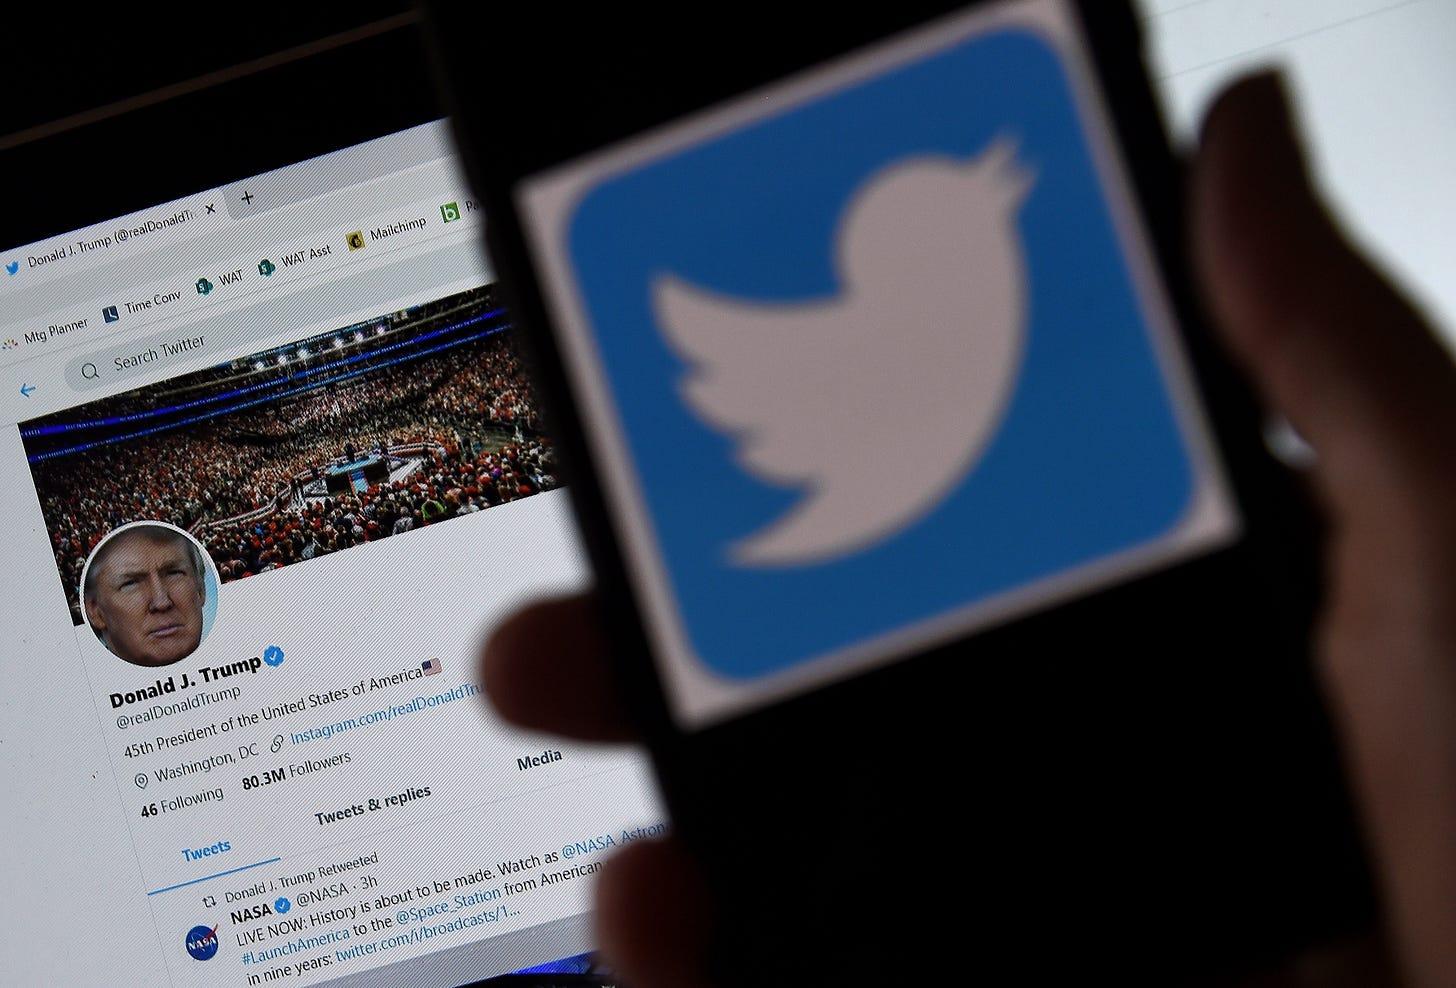 Section 230: Donald Trump vs. Twitter